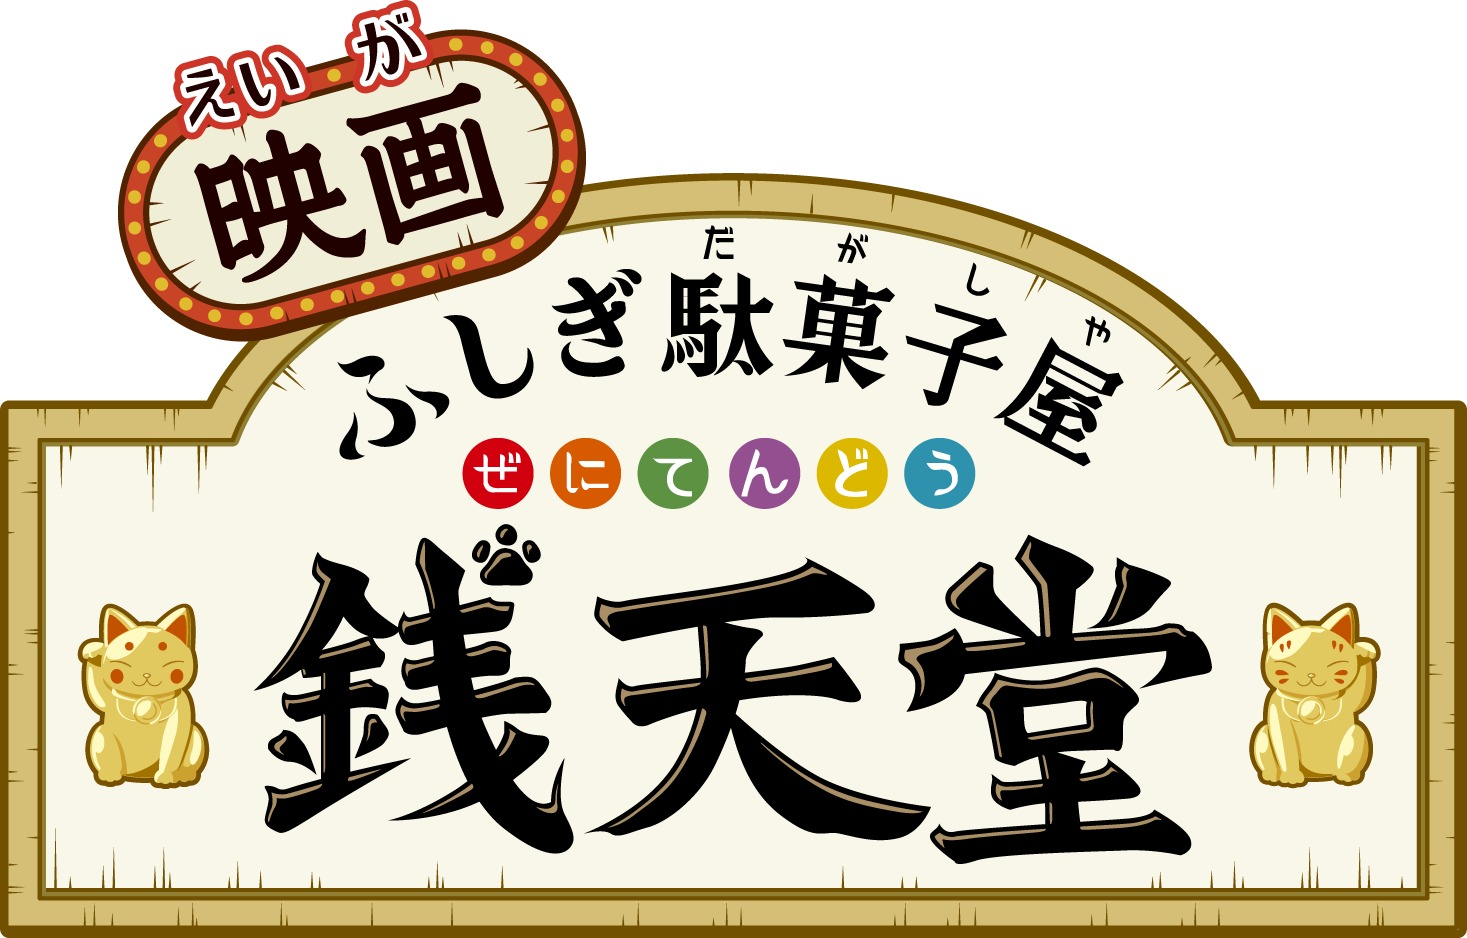 (C)廣嶋玲子・jyajya/偕成社  (C)2020東映まんがまつり製作委員会